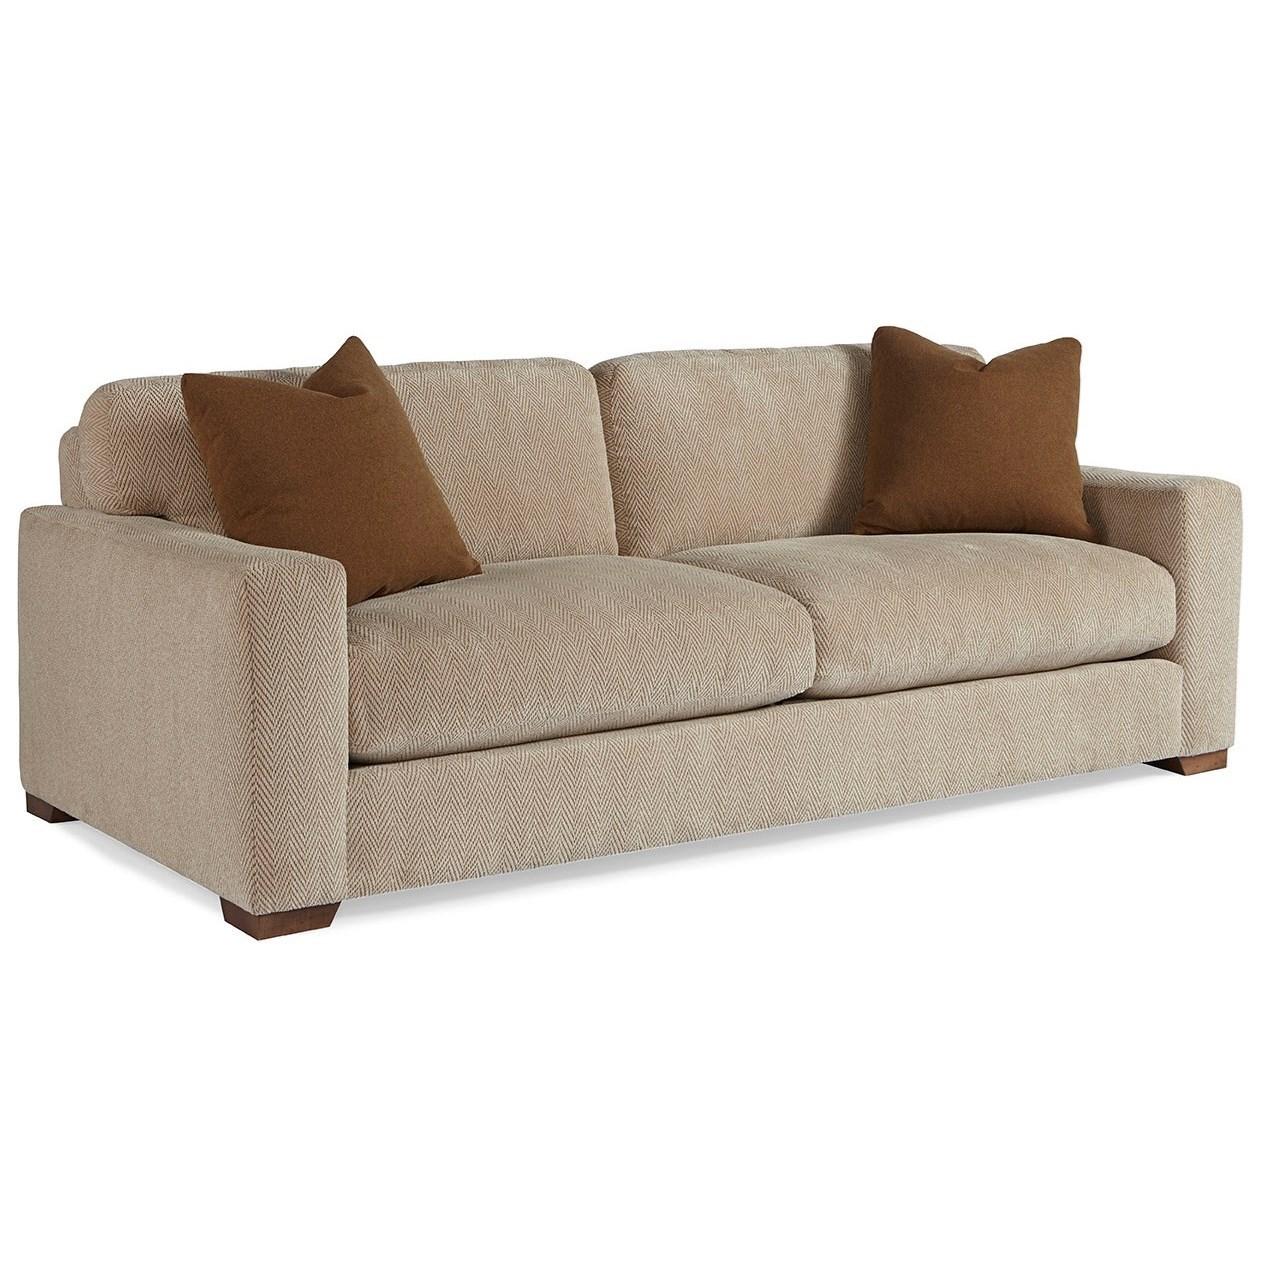 Dakota Sofa by Rowe at Wilson's Furniture